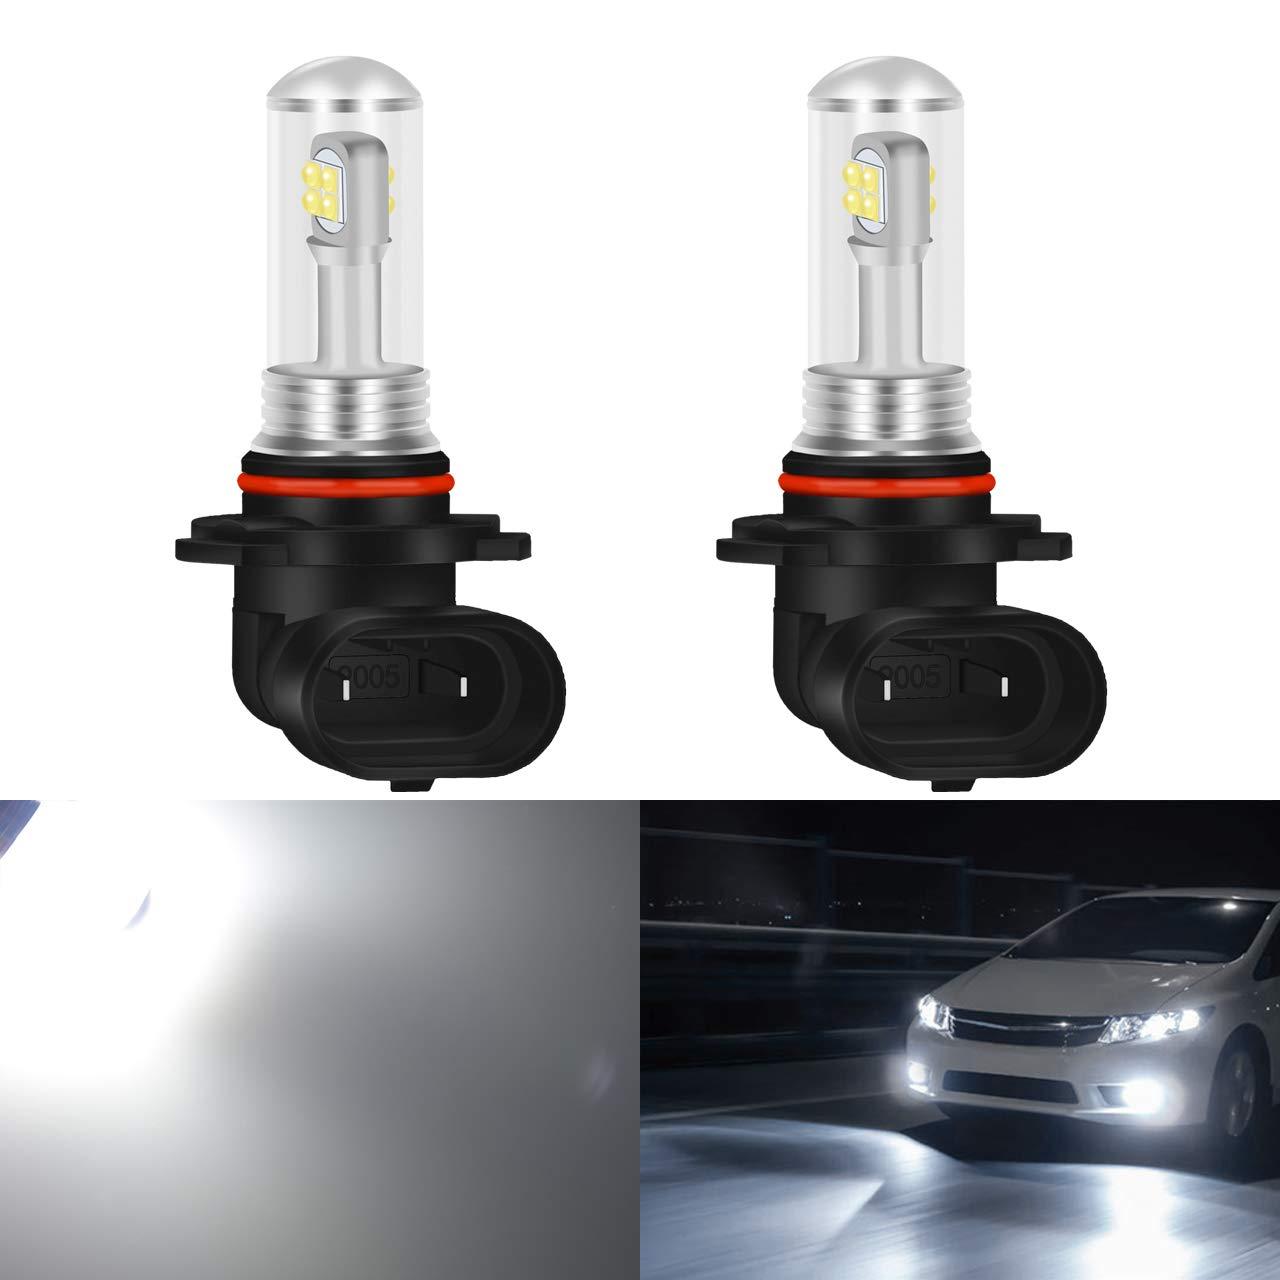 2-Pack KaTur 1500 Lumens CREE Chips 8SMD 40W 7506 1156 BA15S P21W 1141 1095 1073 LED Brake Light Reverse Tail Turn Signal Bulbs 12V-24V White 6000K Waterproof IP68